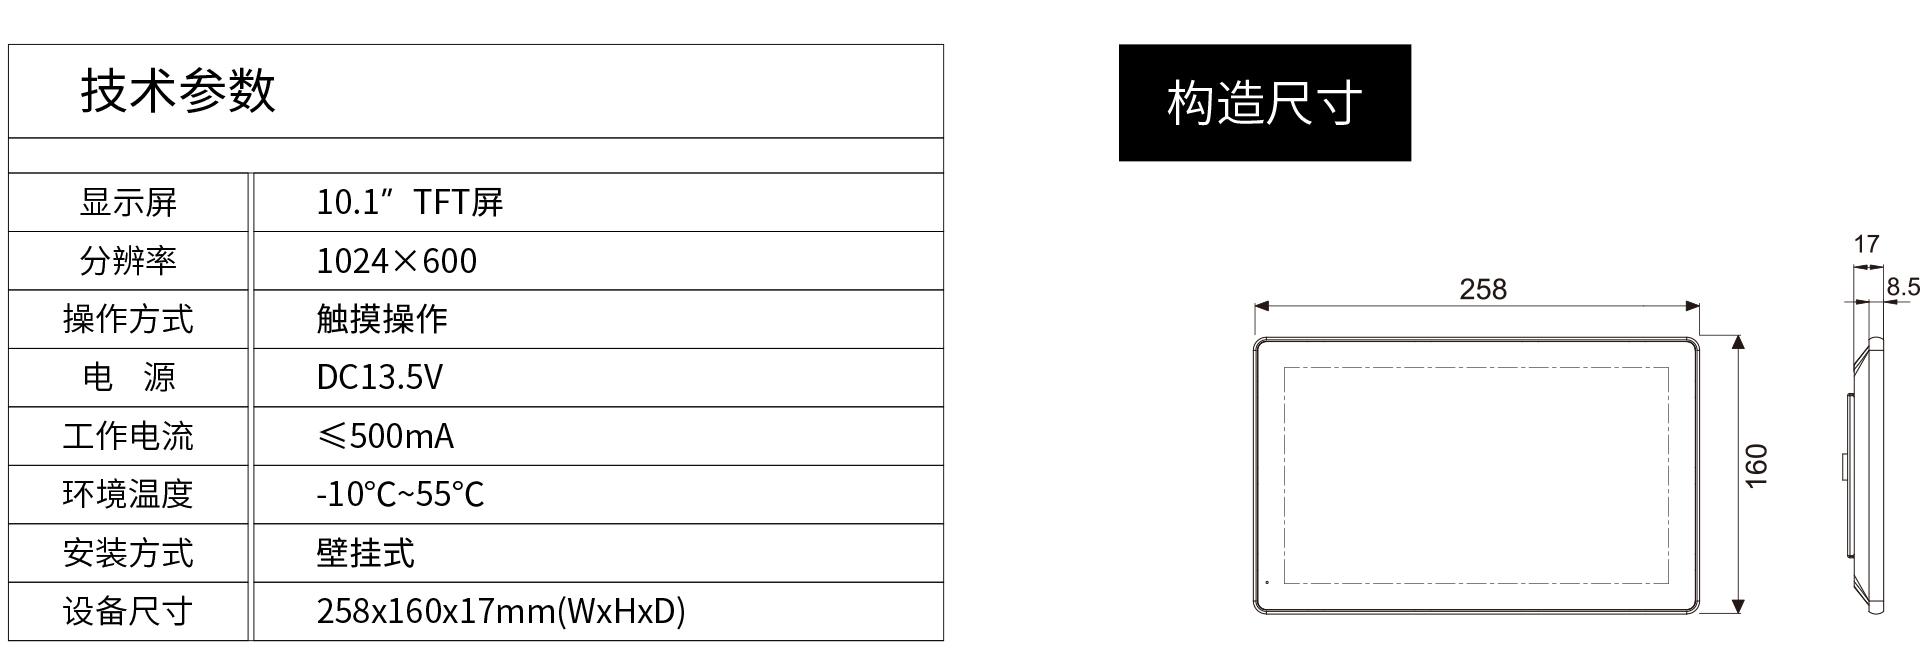 F9室内机参数.jpg